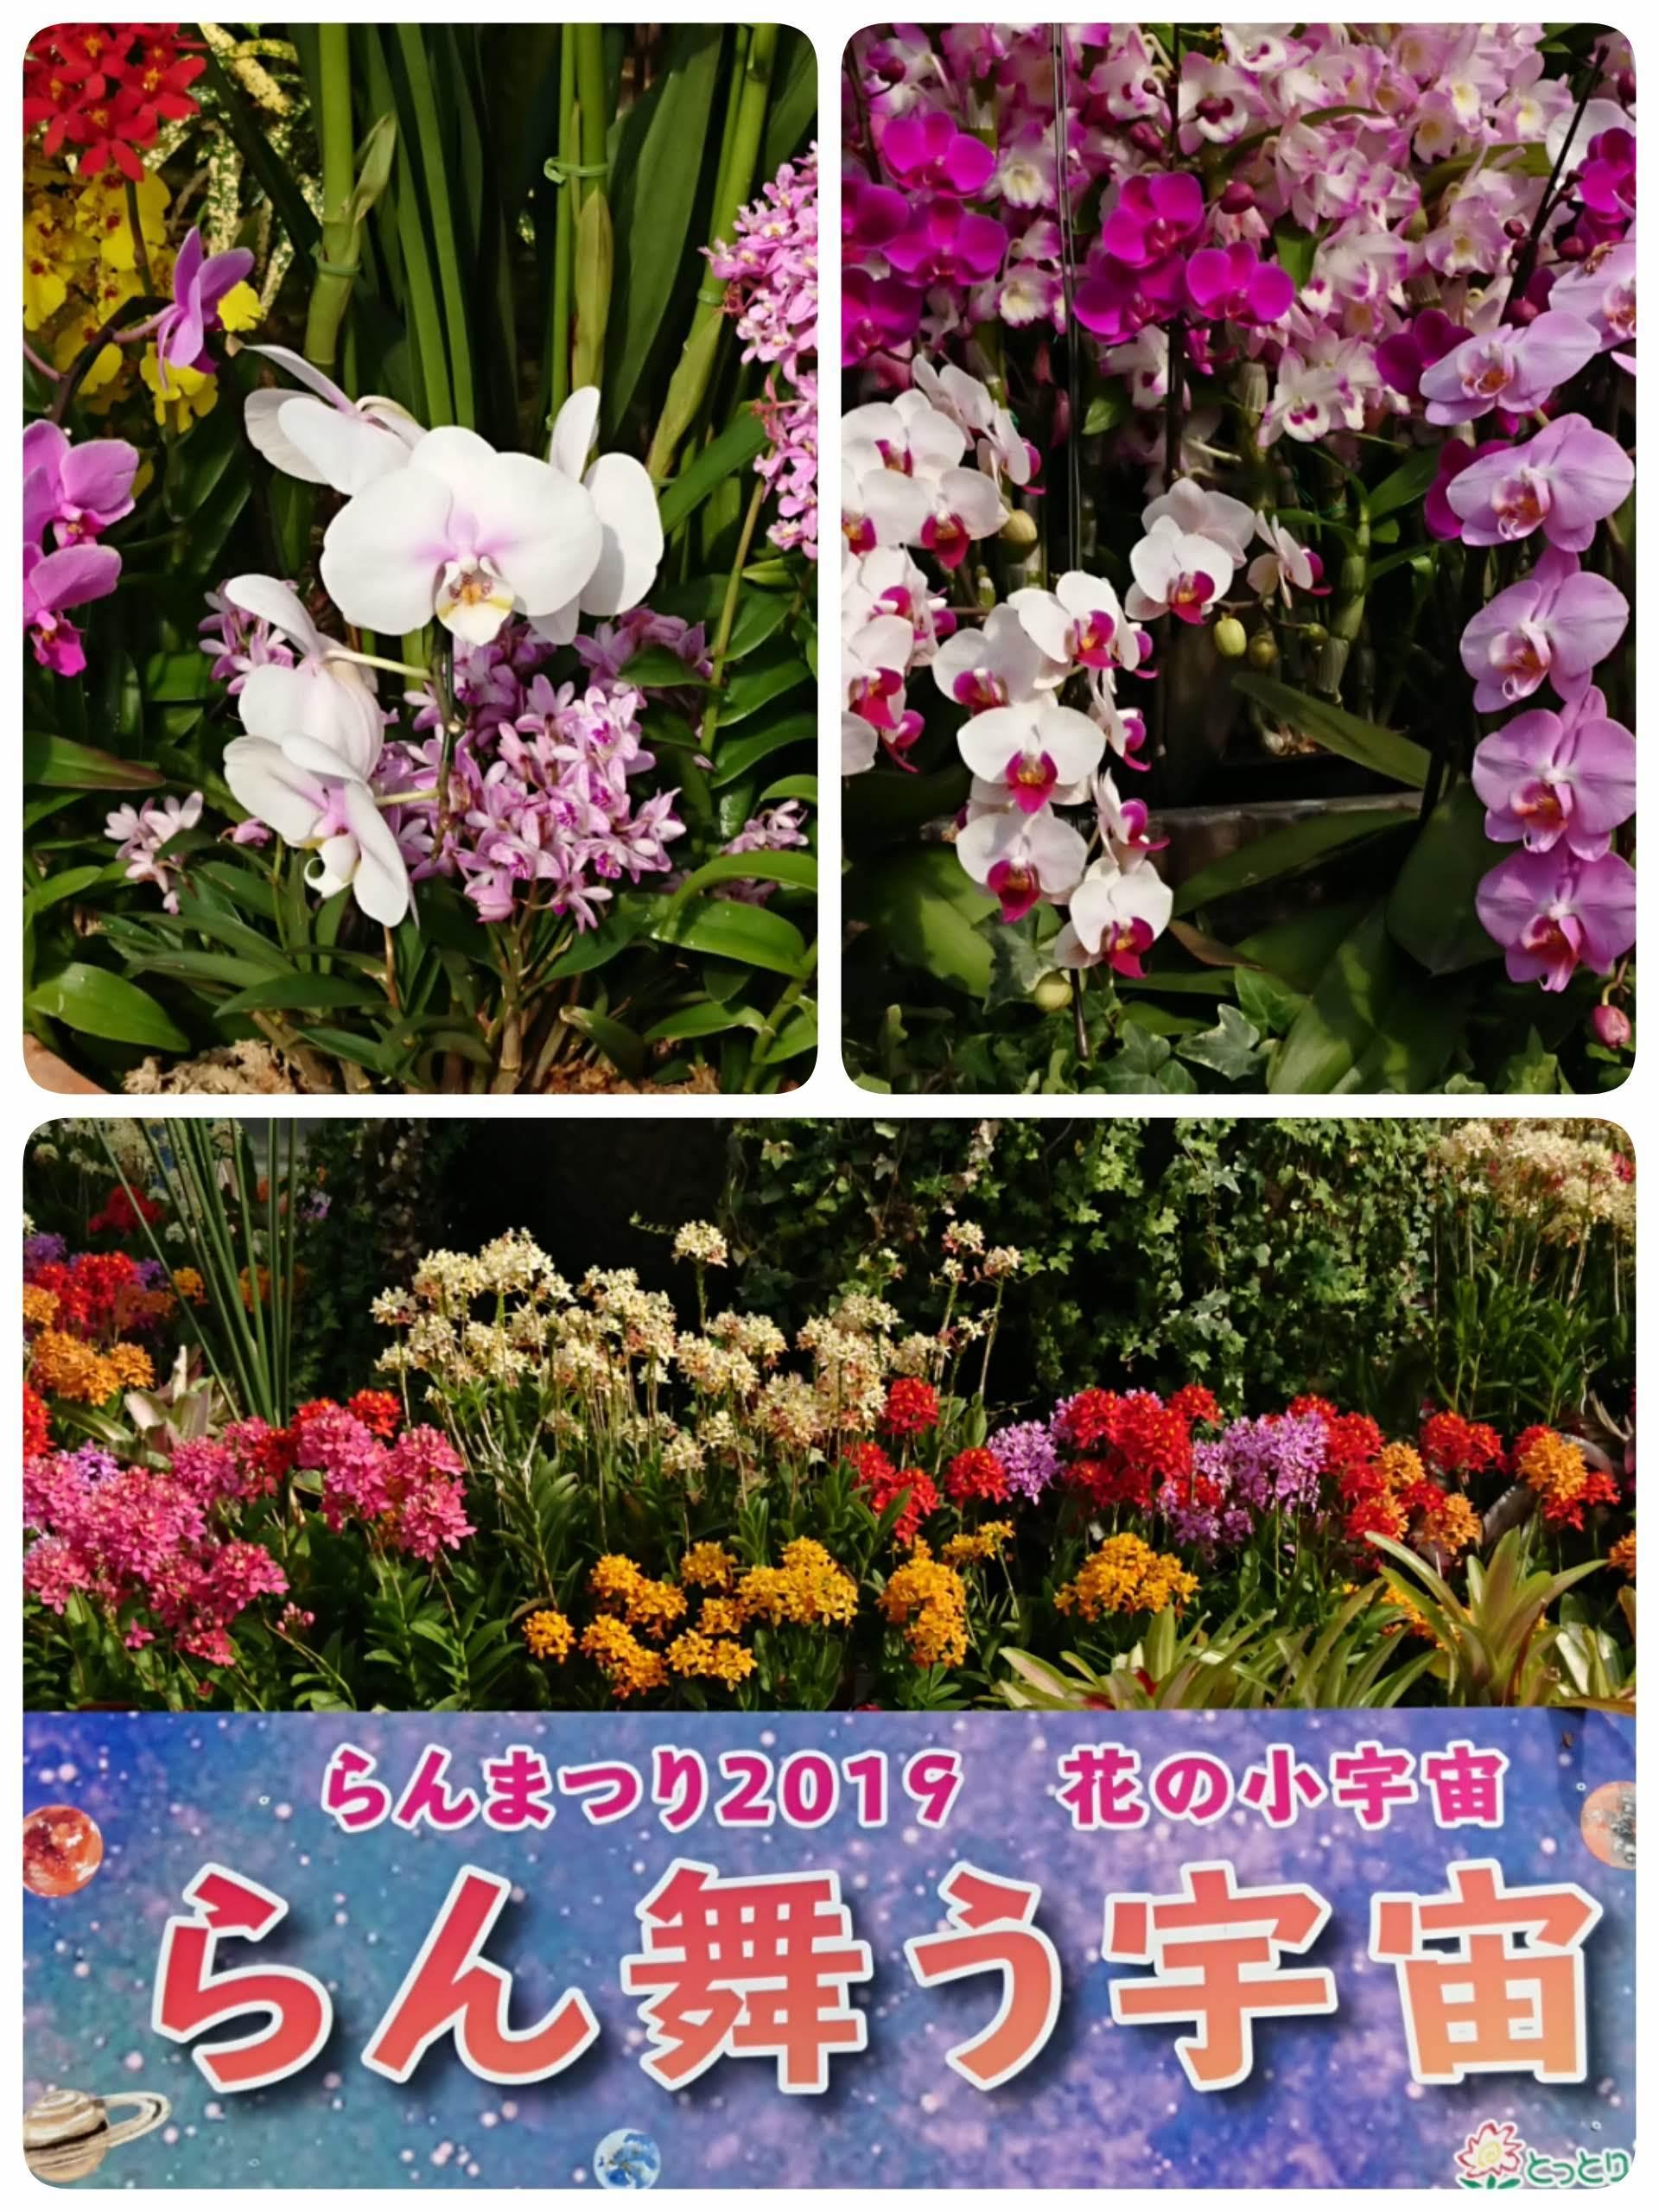 19-03-31-21-07-25-132_deco.jpg